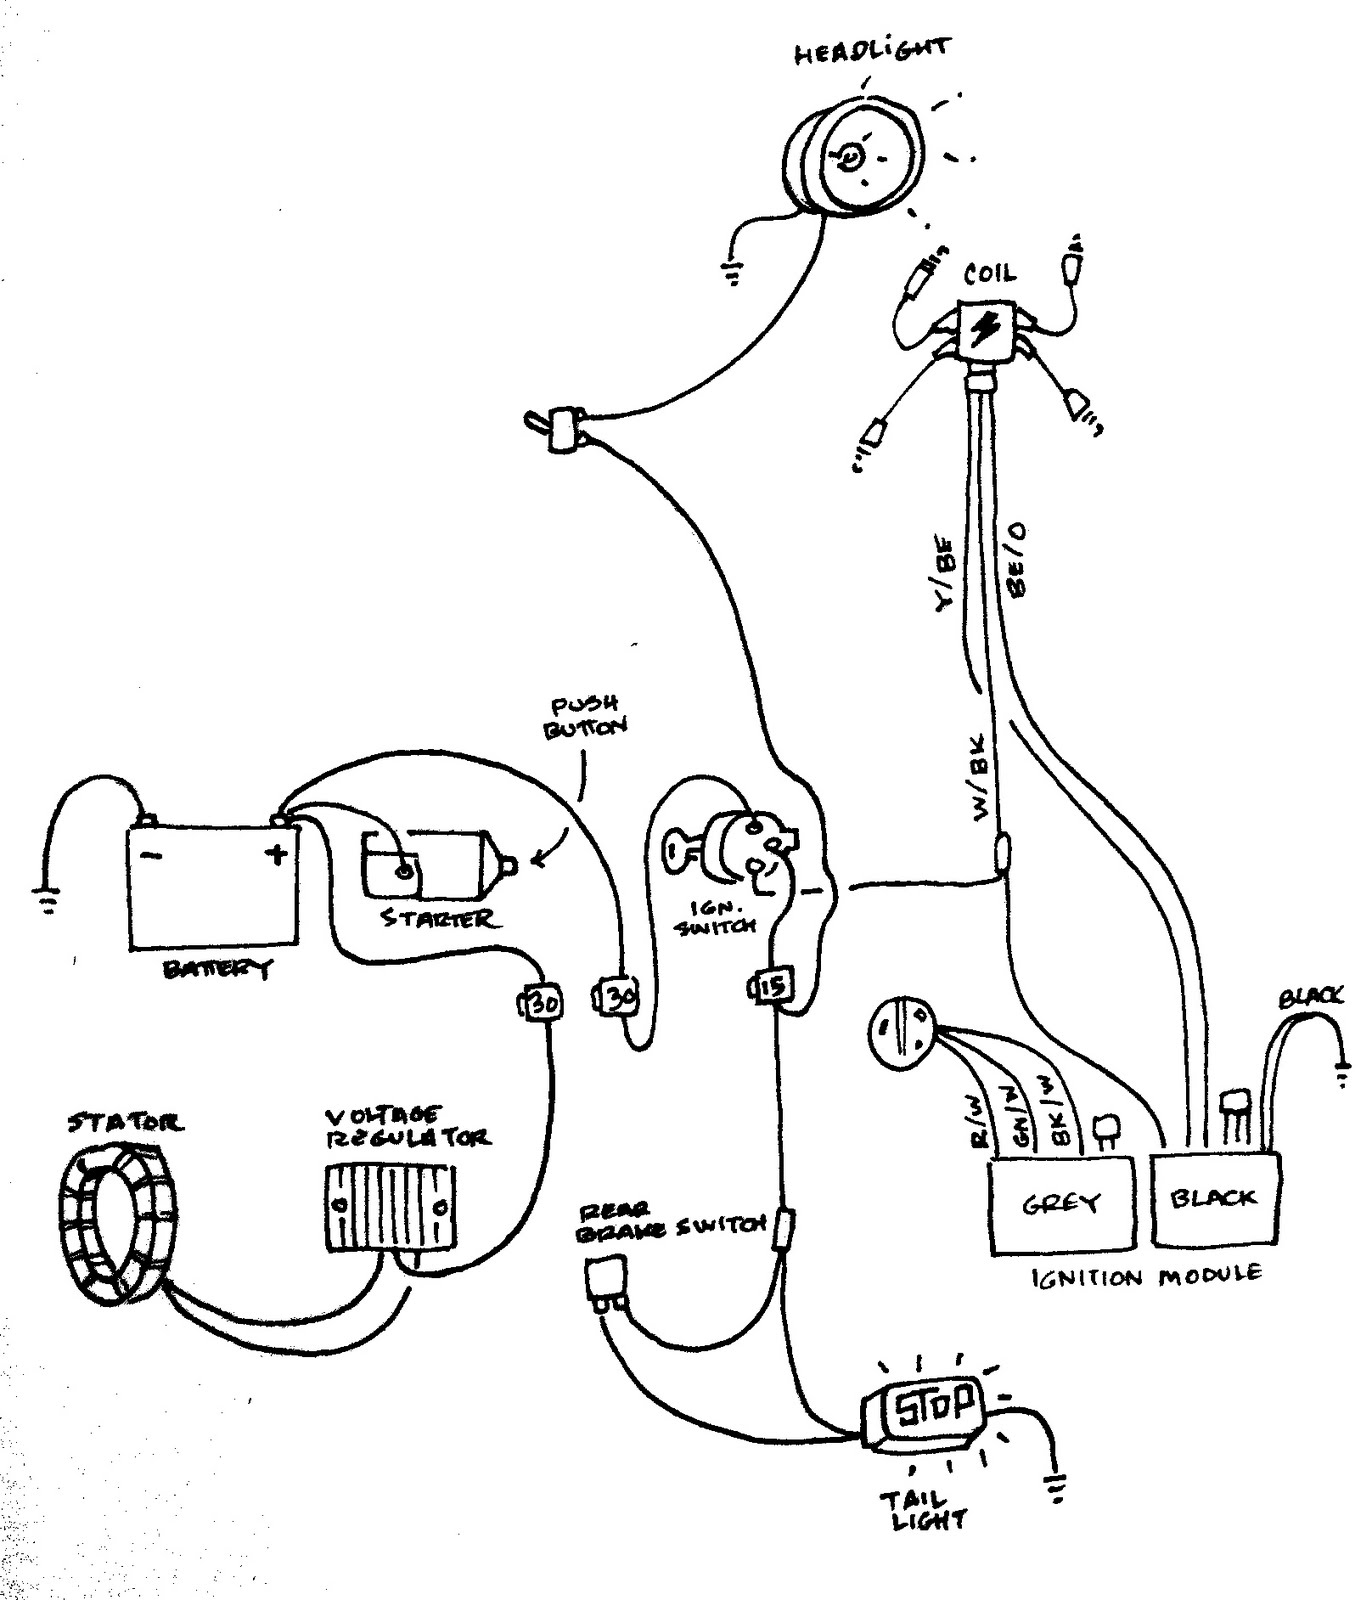 ES_3295] China Chopper 49Cc Wiring Diagram Schematic WiringVulg Rect Seme Semec Viewor Mohammedshrine Librar Wiring 101